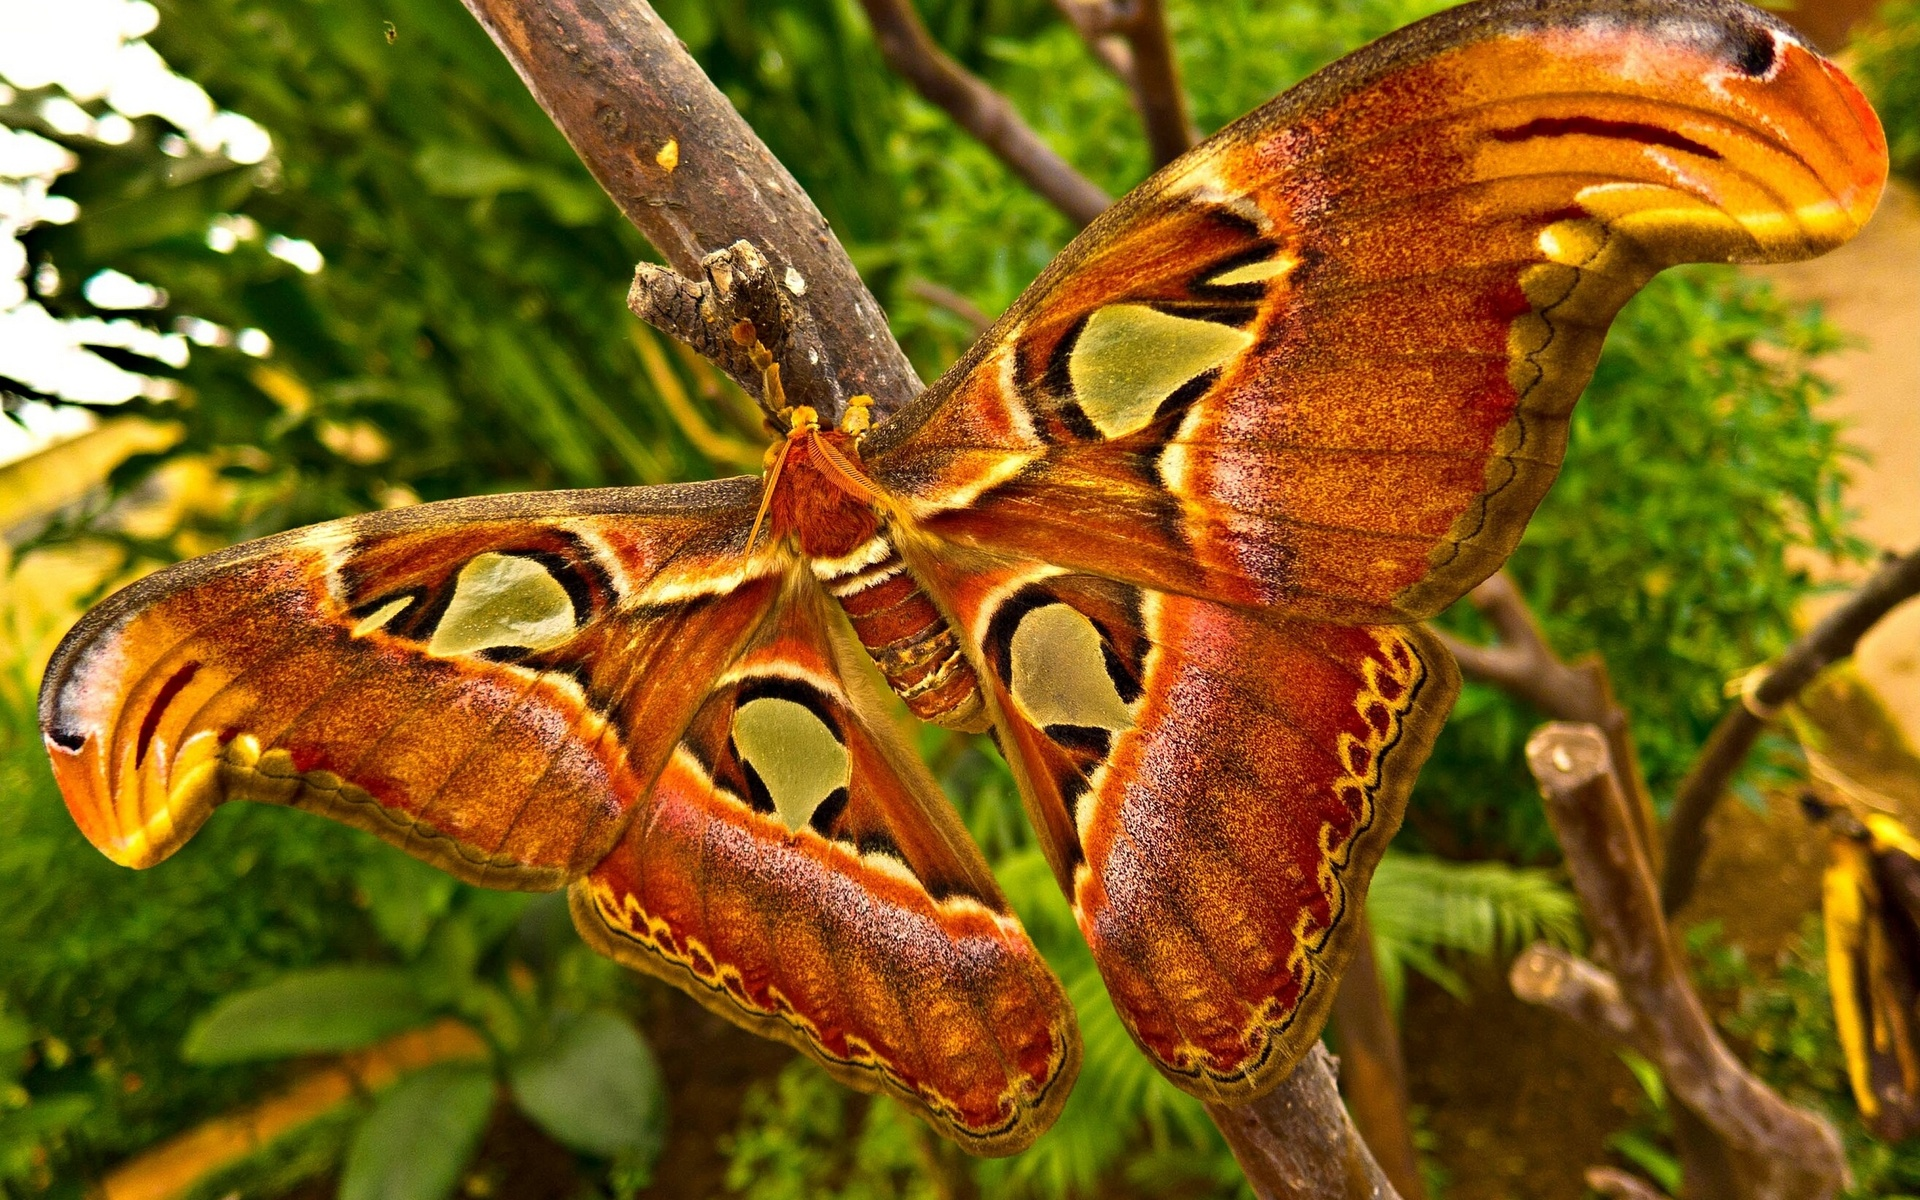 Tropical Rainforest Animals Wallpaper | www.pixshark.com ...